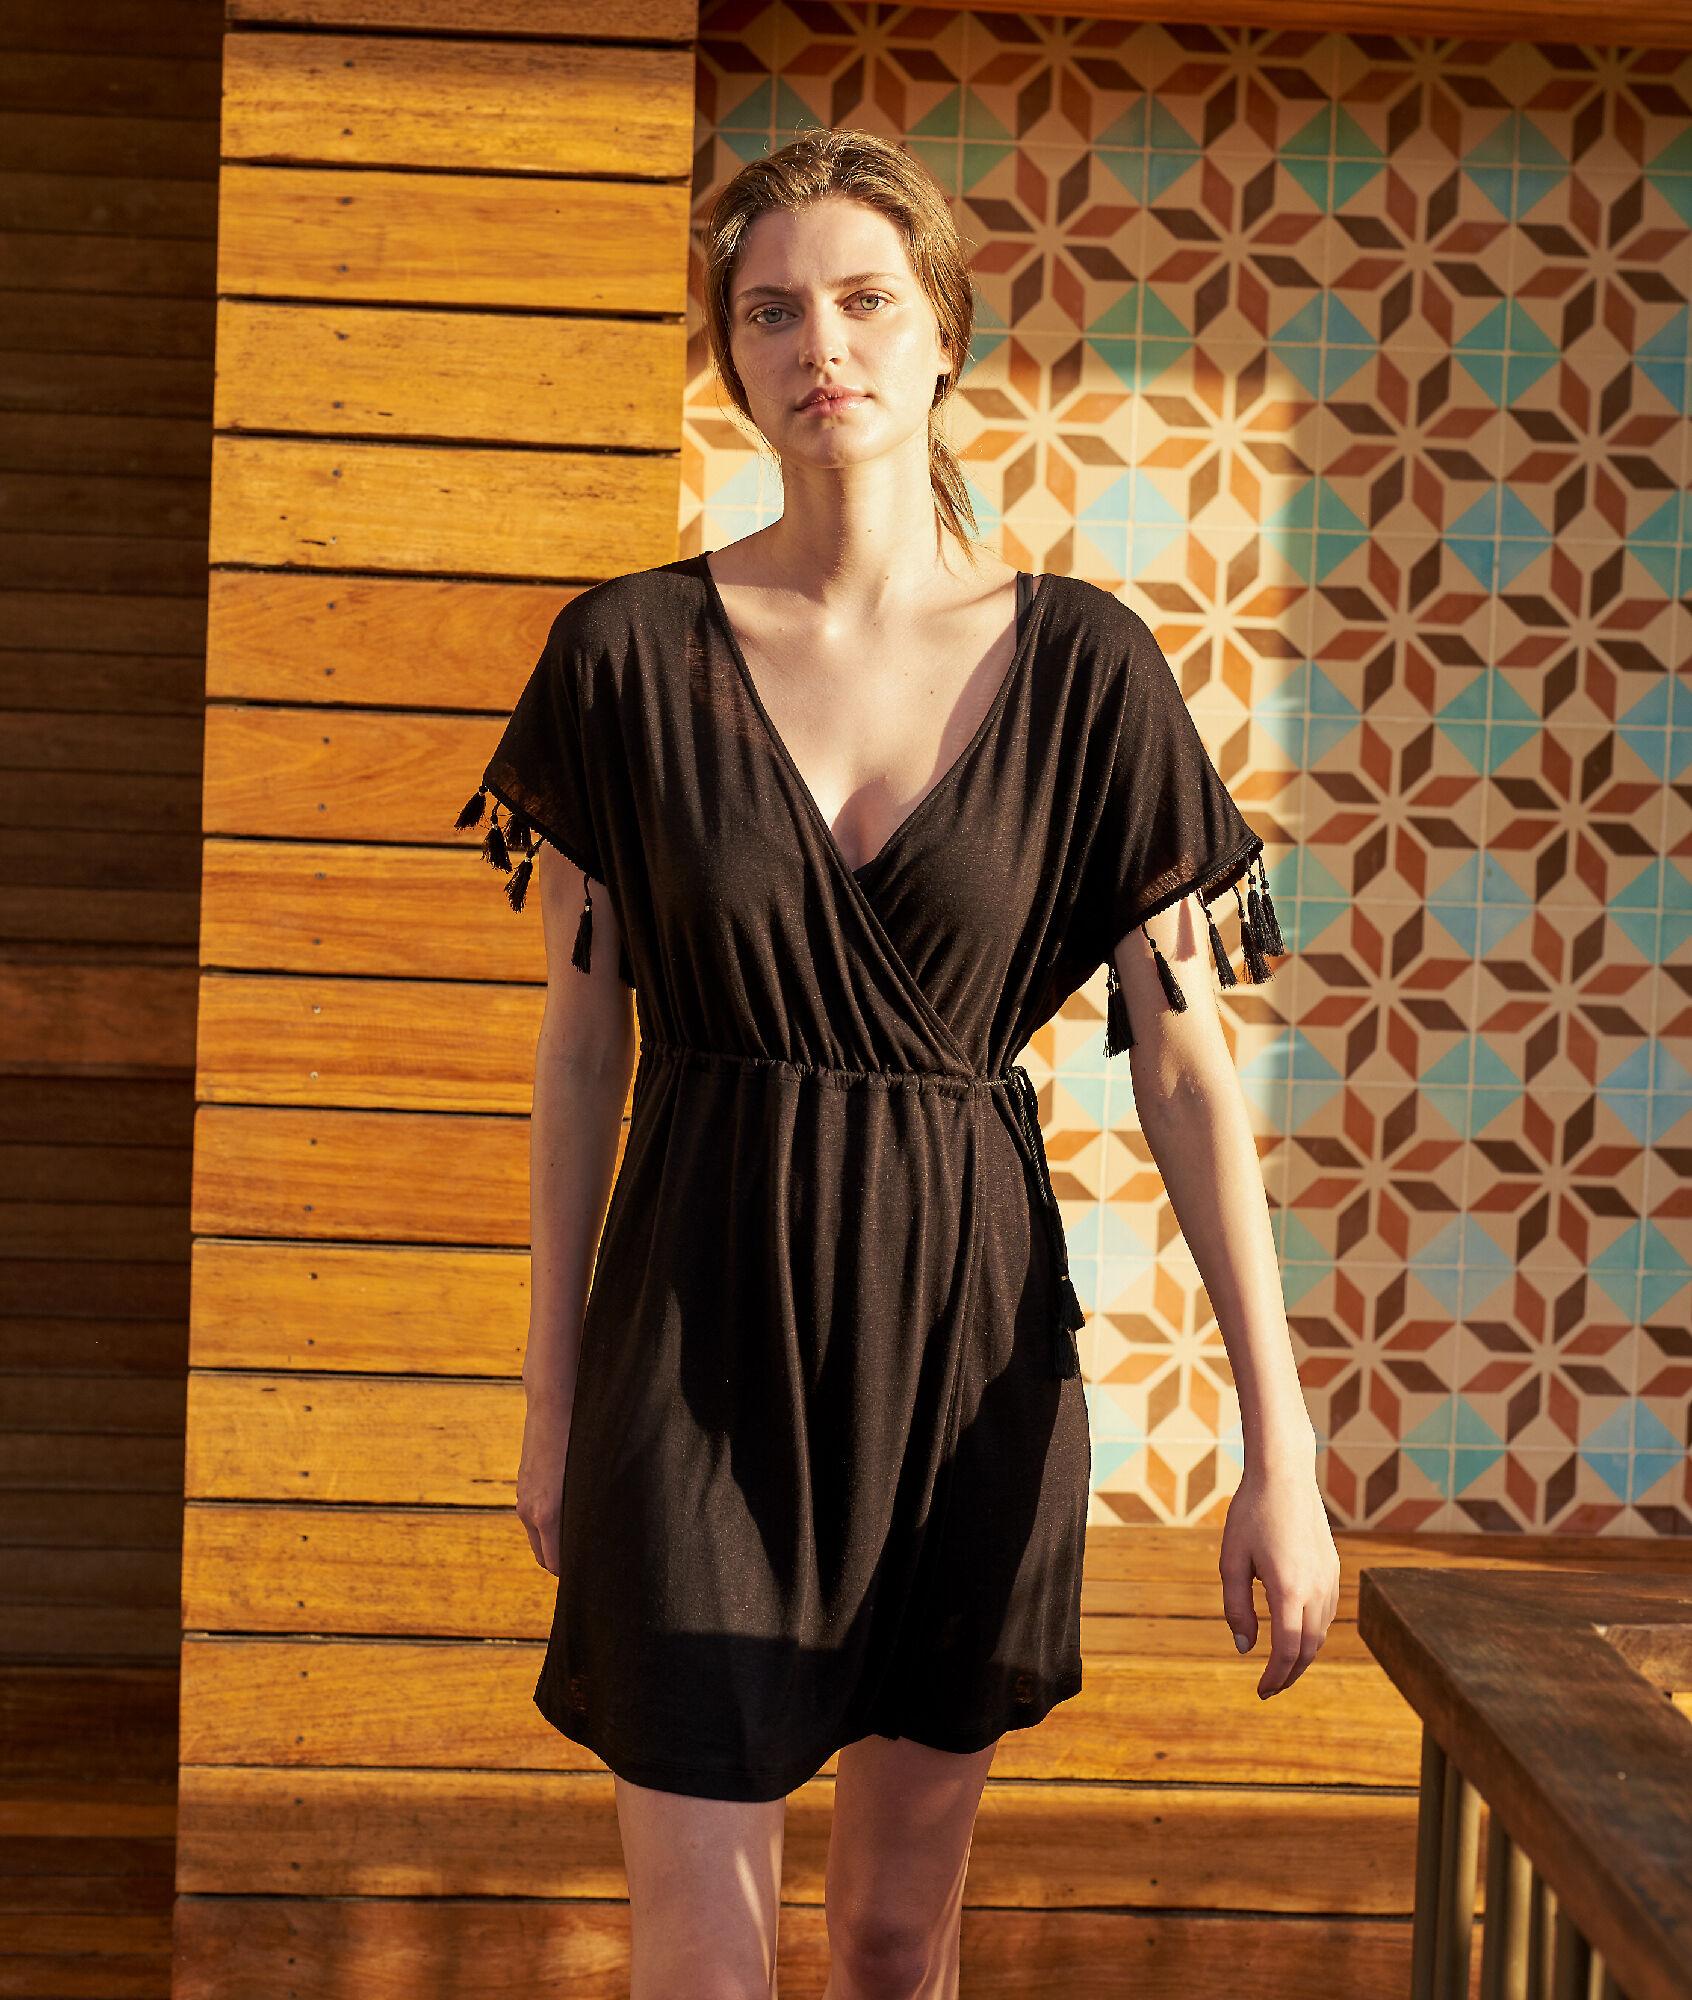 03c6951c00e7 Plážový oděv s výstřihem do V a zády zdobenými grafickou krajkou - Etam